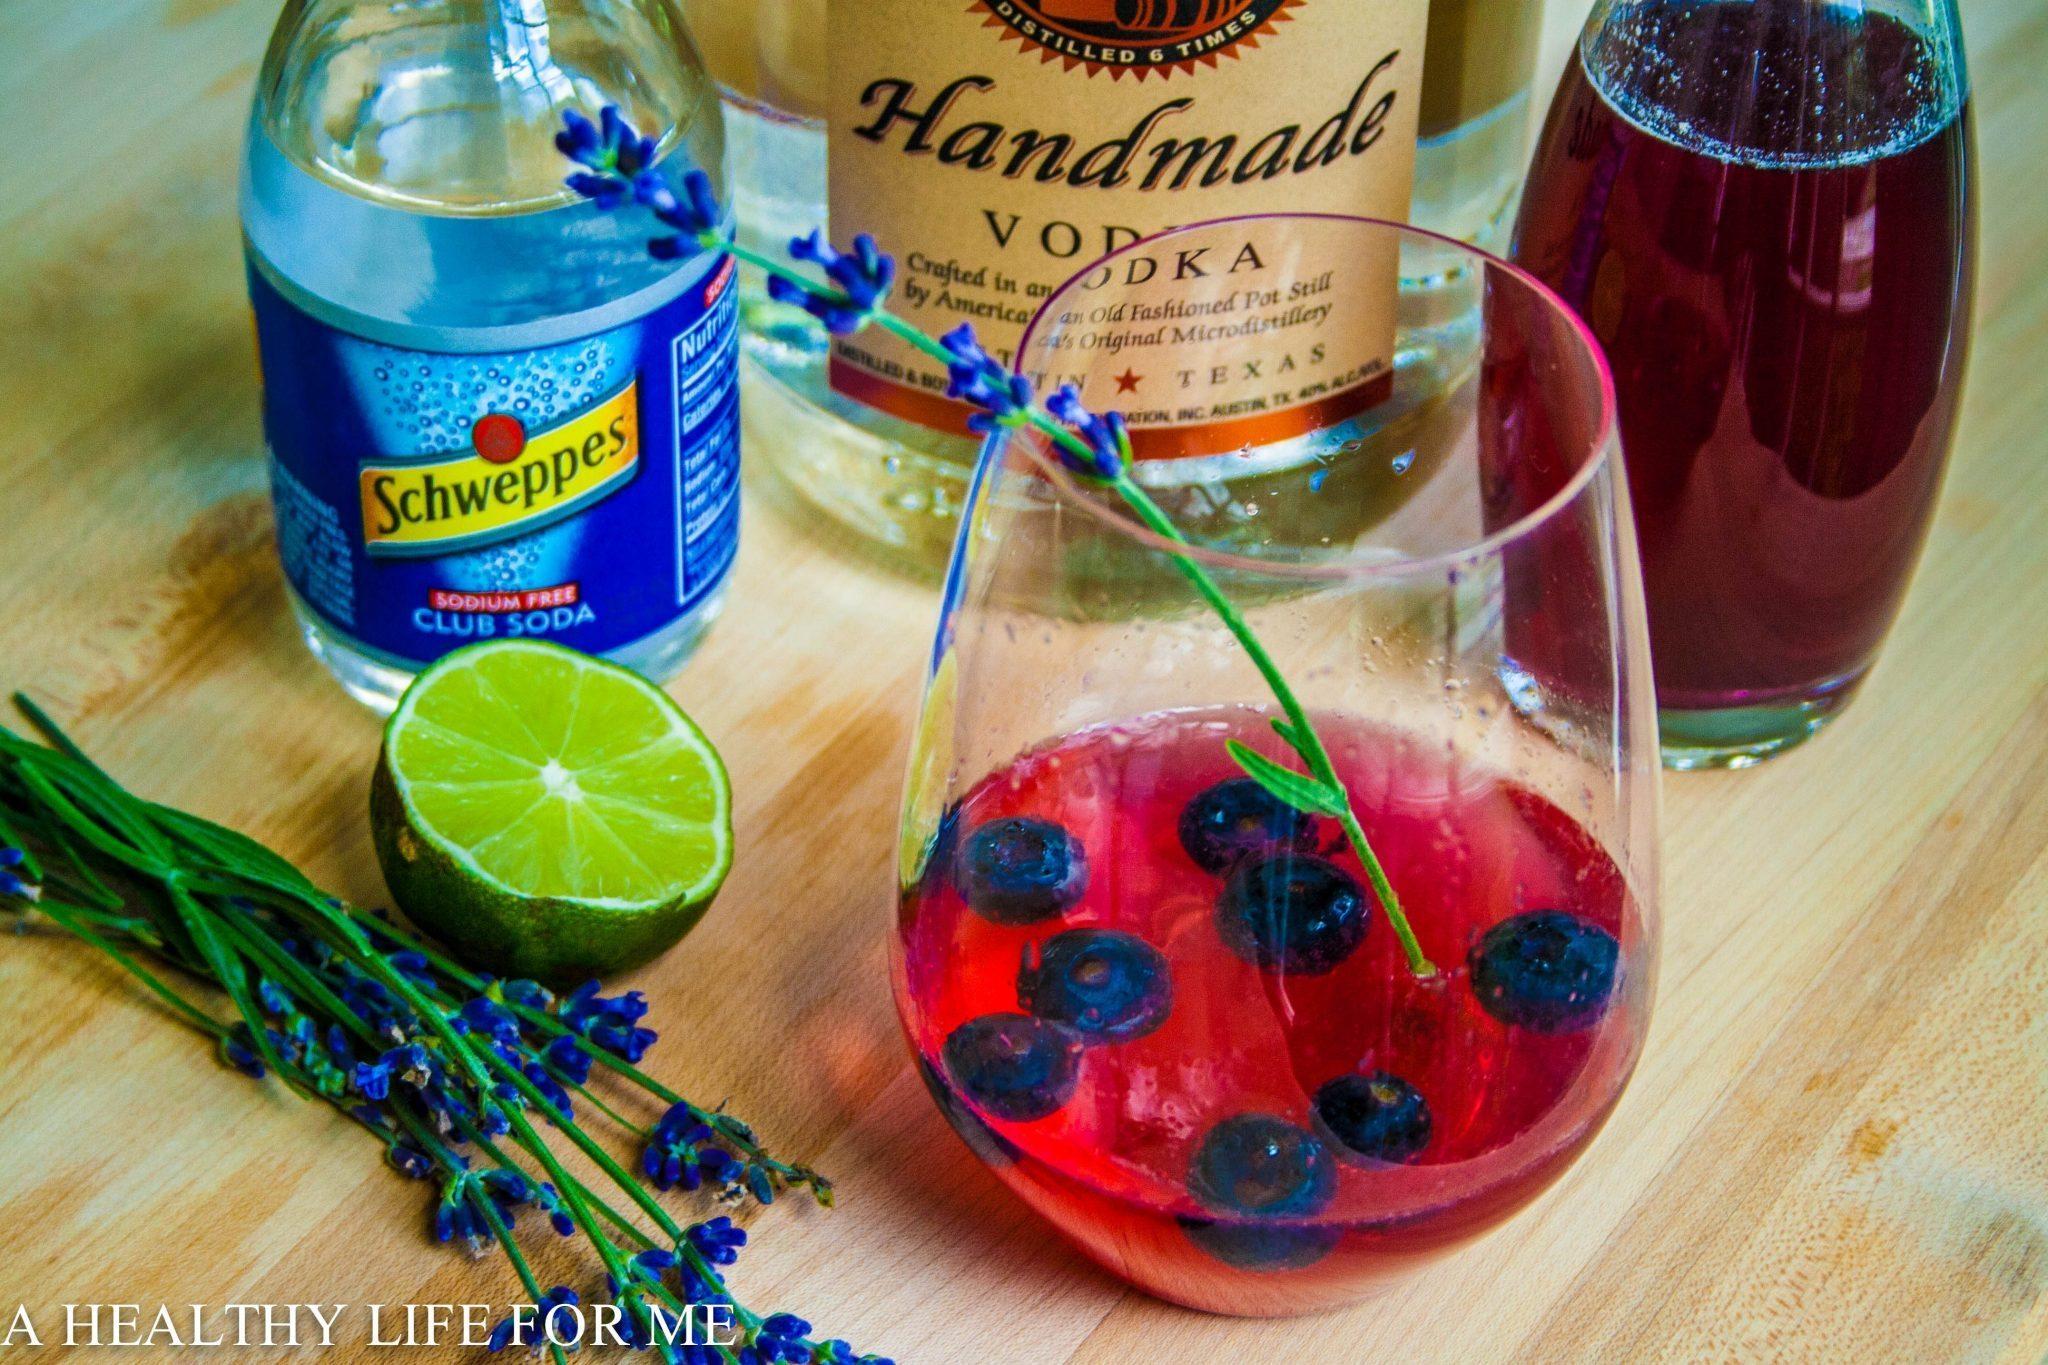 spritzer rosemary citrus spritzer cranberry orange spritzer cherry ...